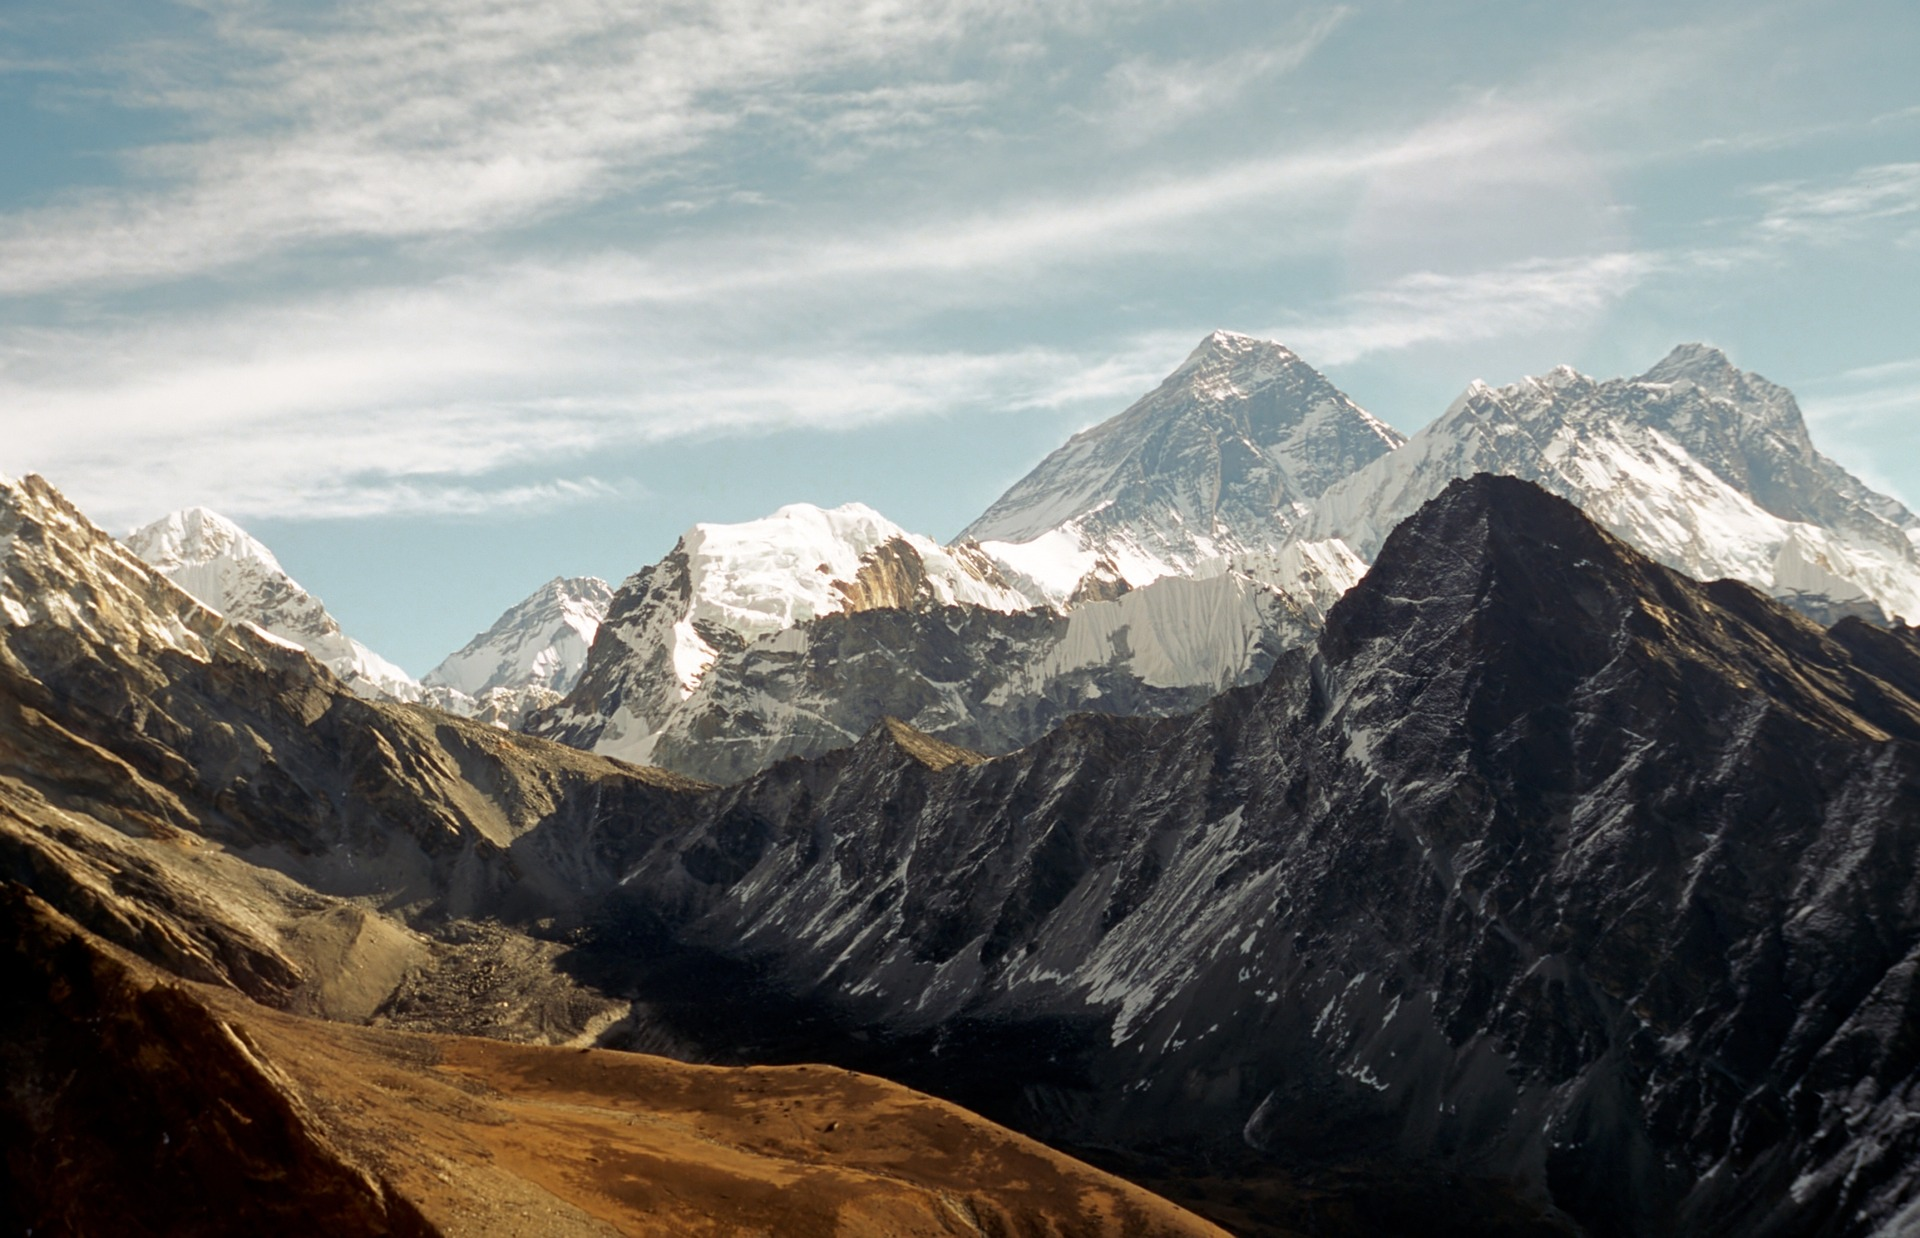 The mountains rising high above Sagarmatha National Park.